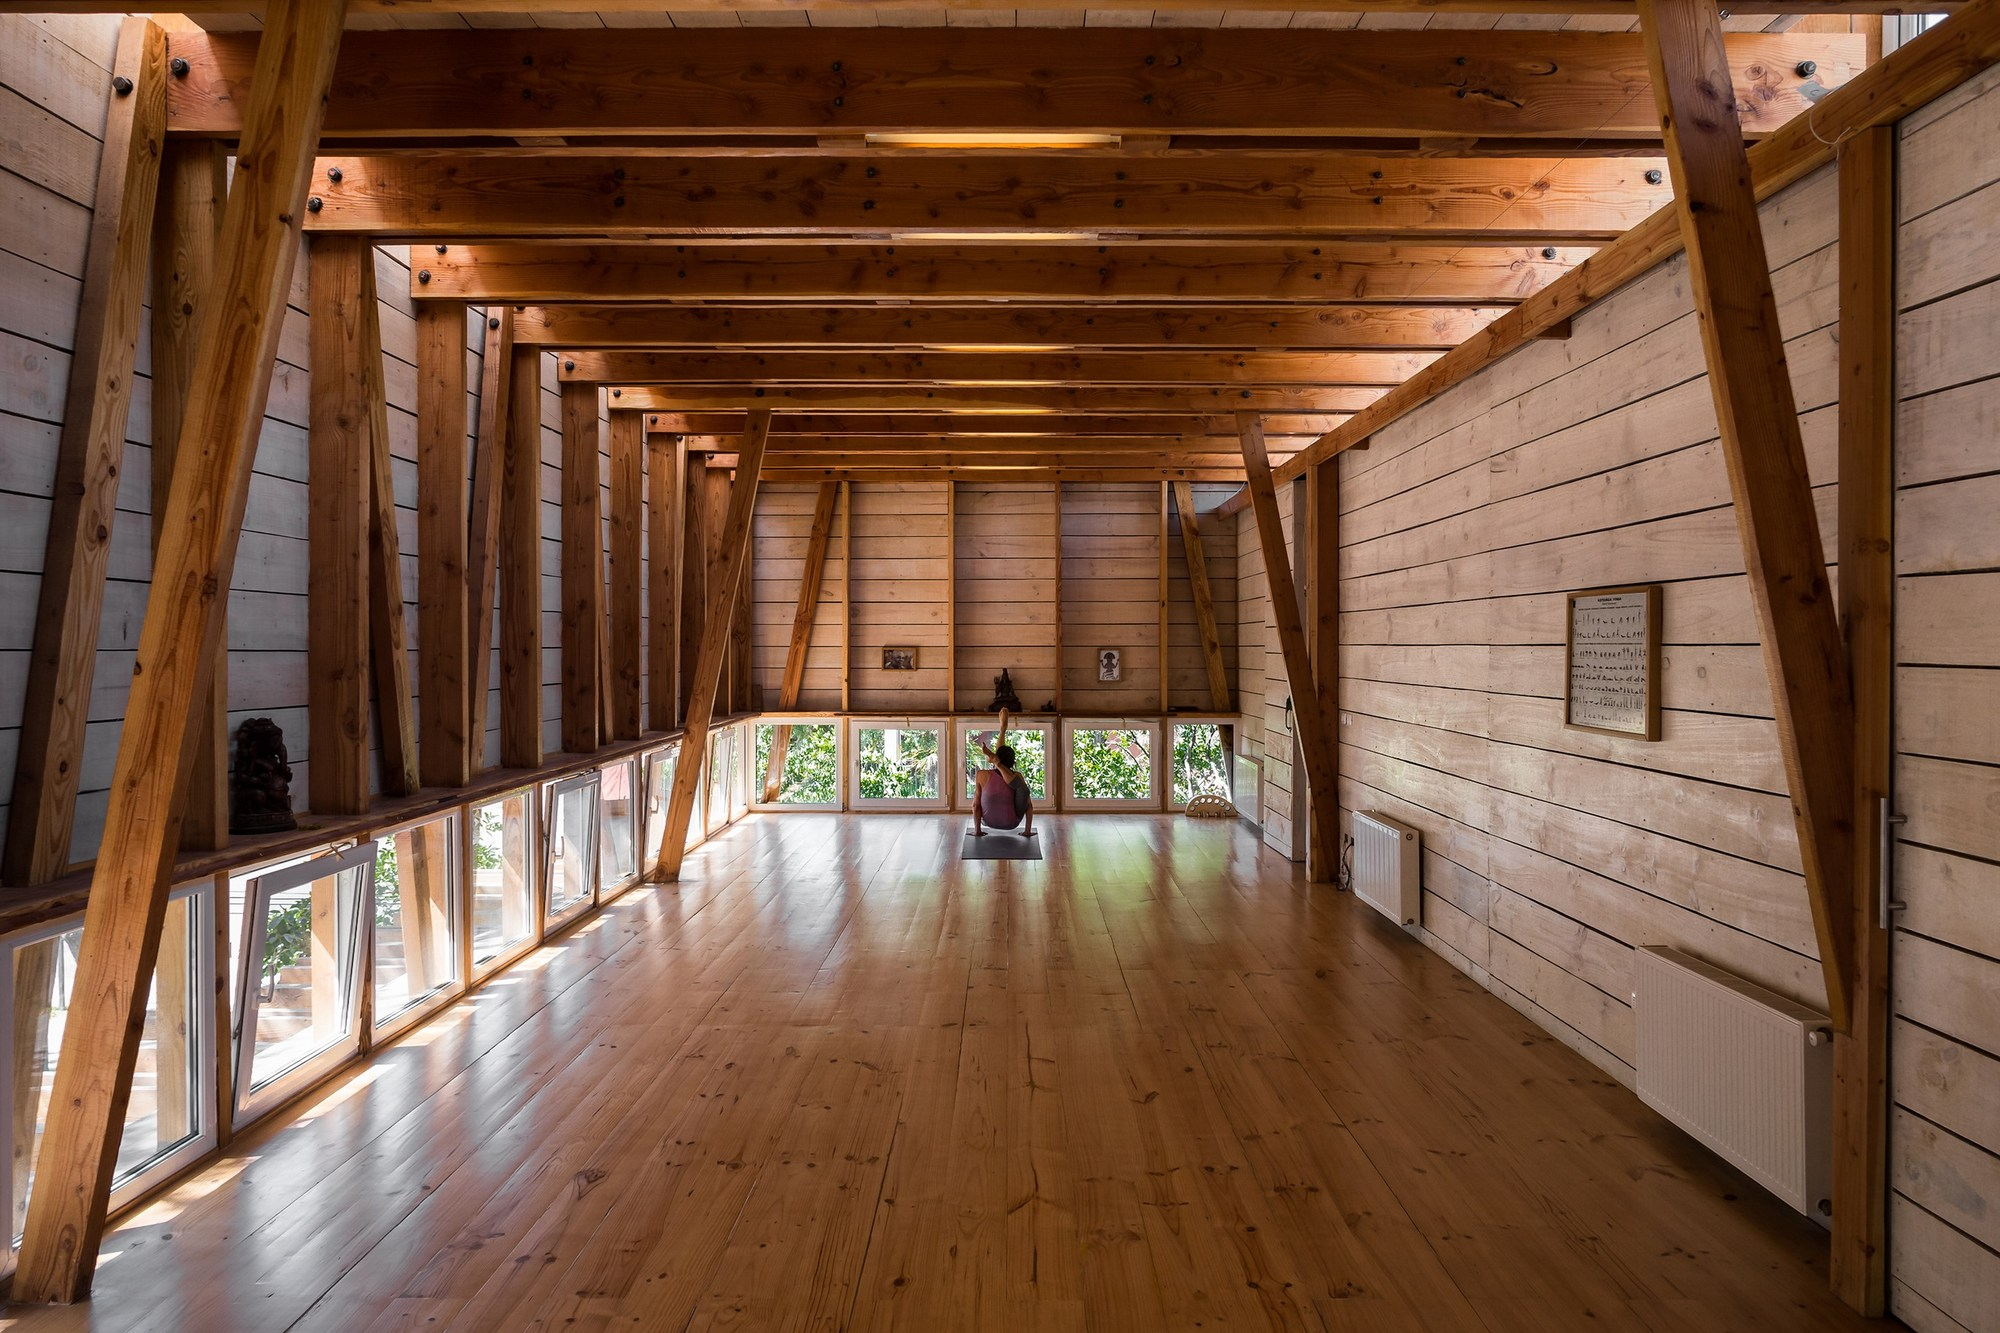 Ayc dx arquitectos archdaily - Casas rurales de madera ...